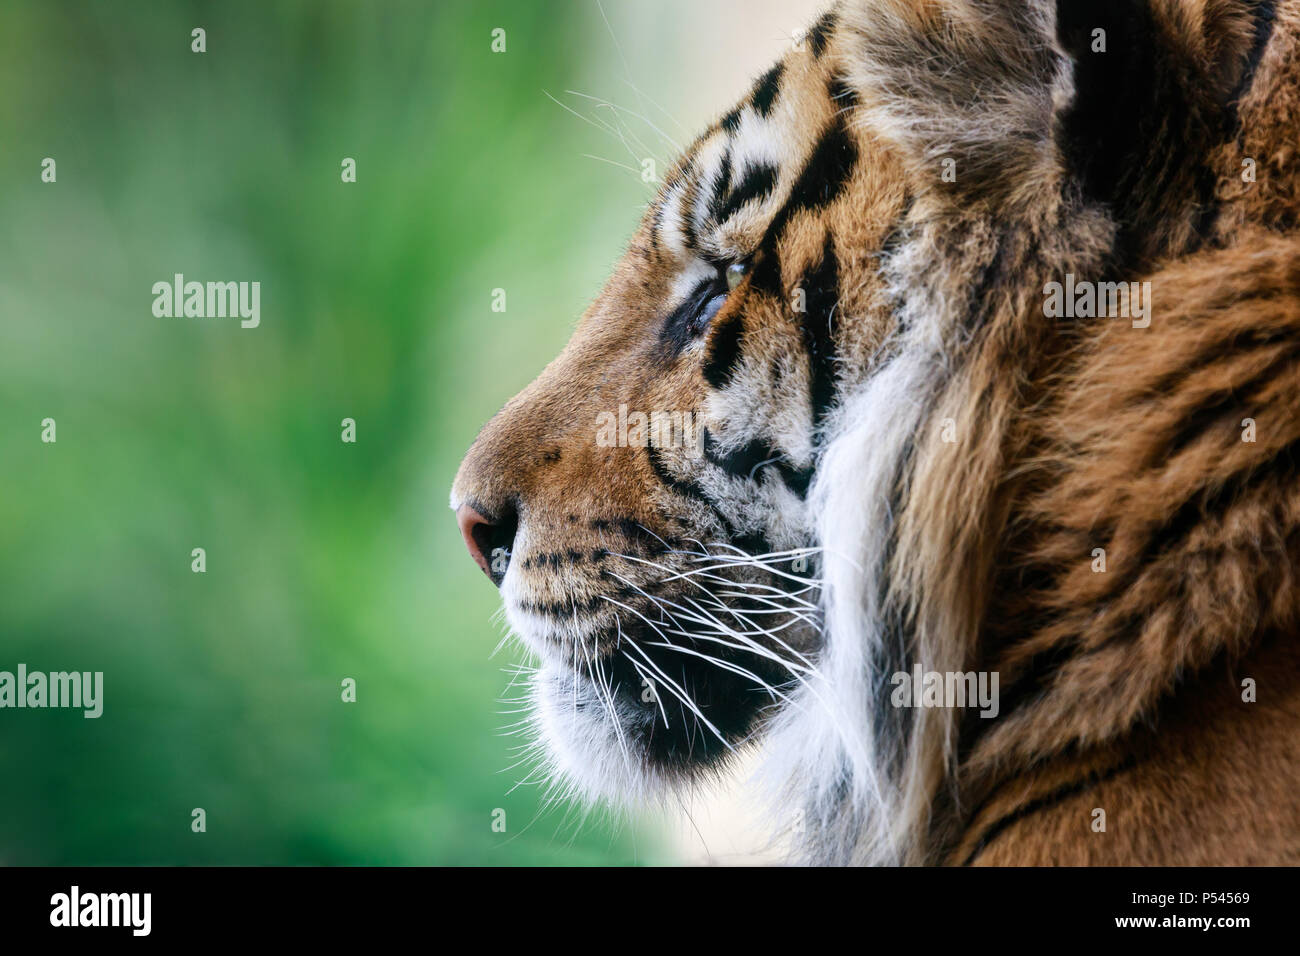 Close up profile portrait of a male Sumatran Tiger, Jae Jae - Stock Image